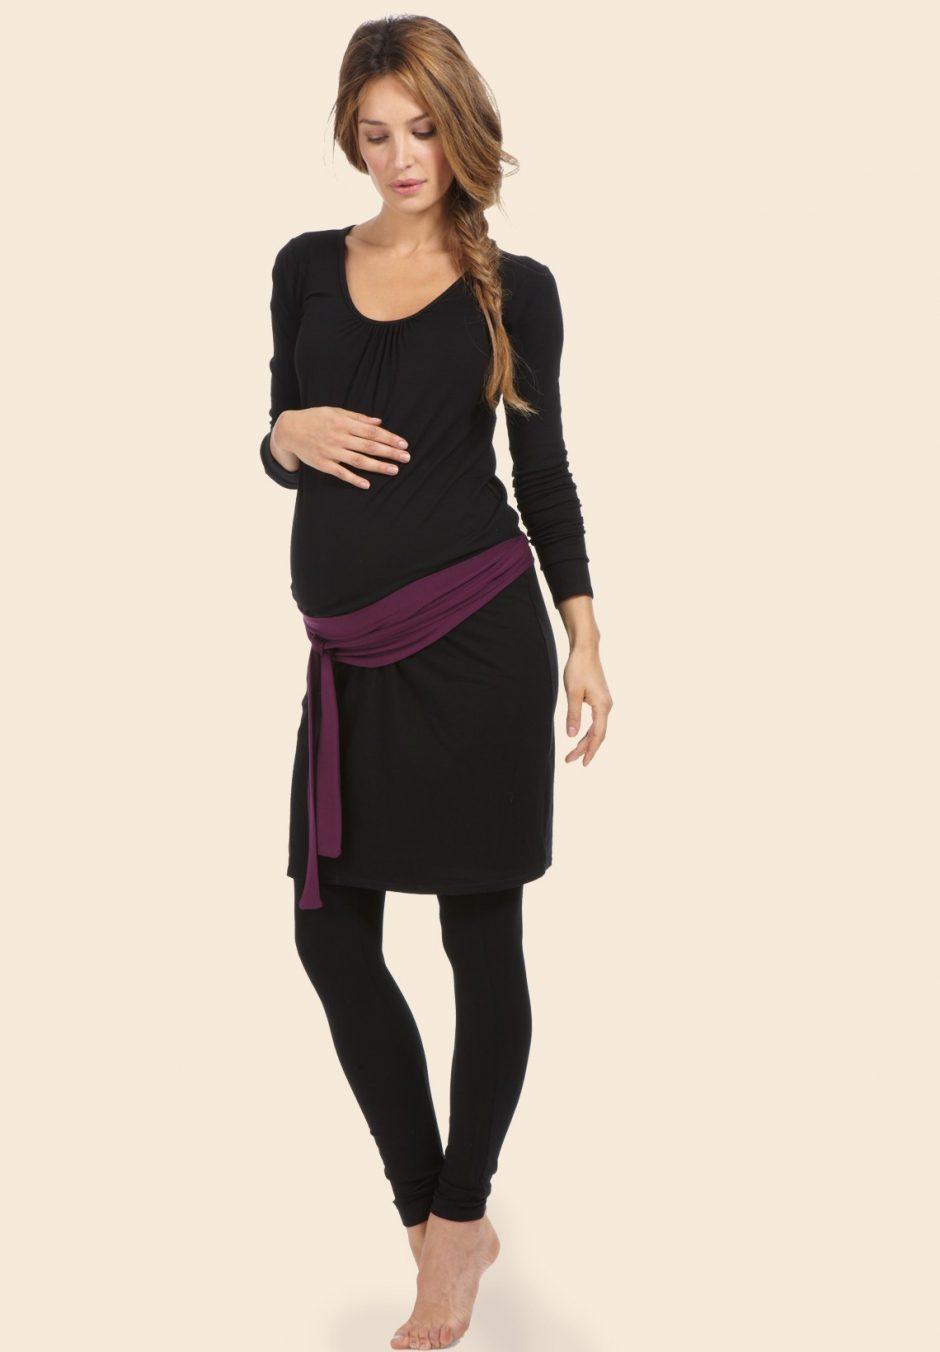 Vetements femme enceinte